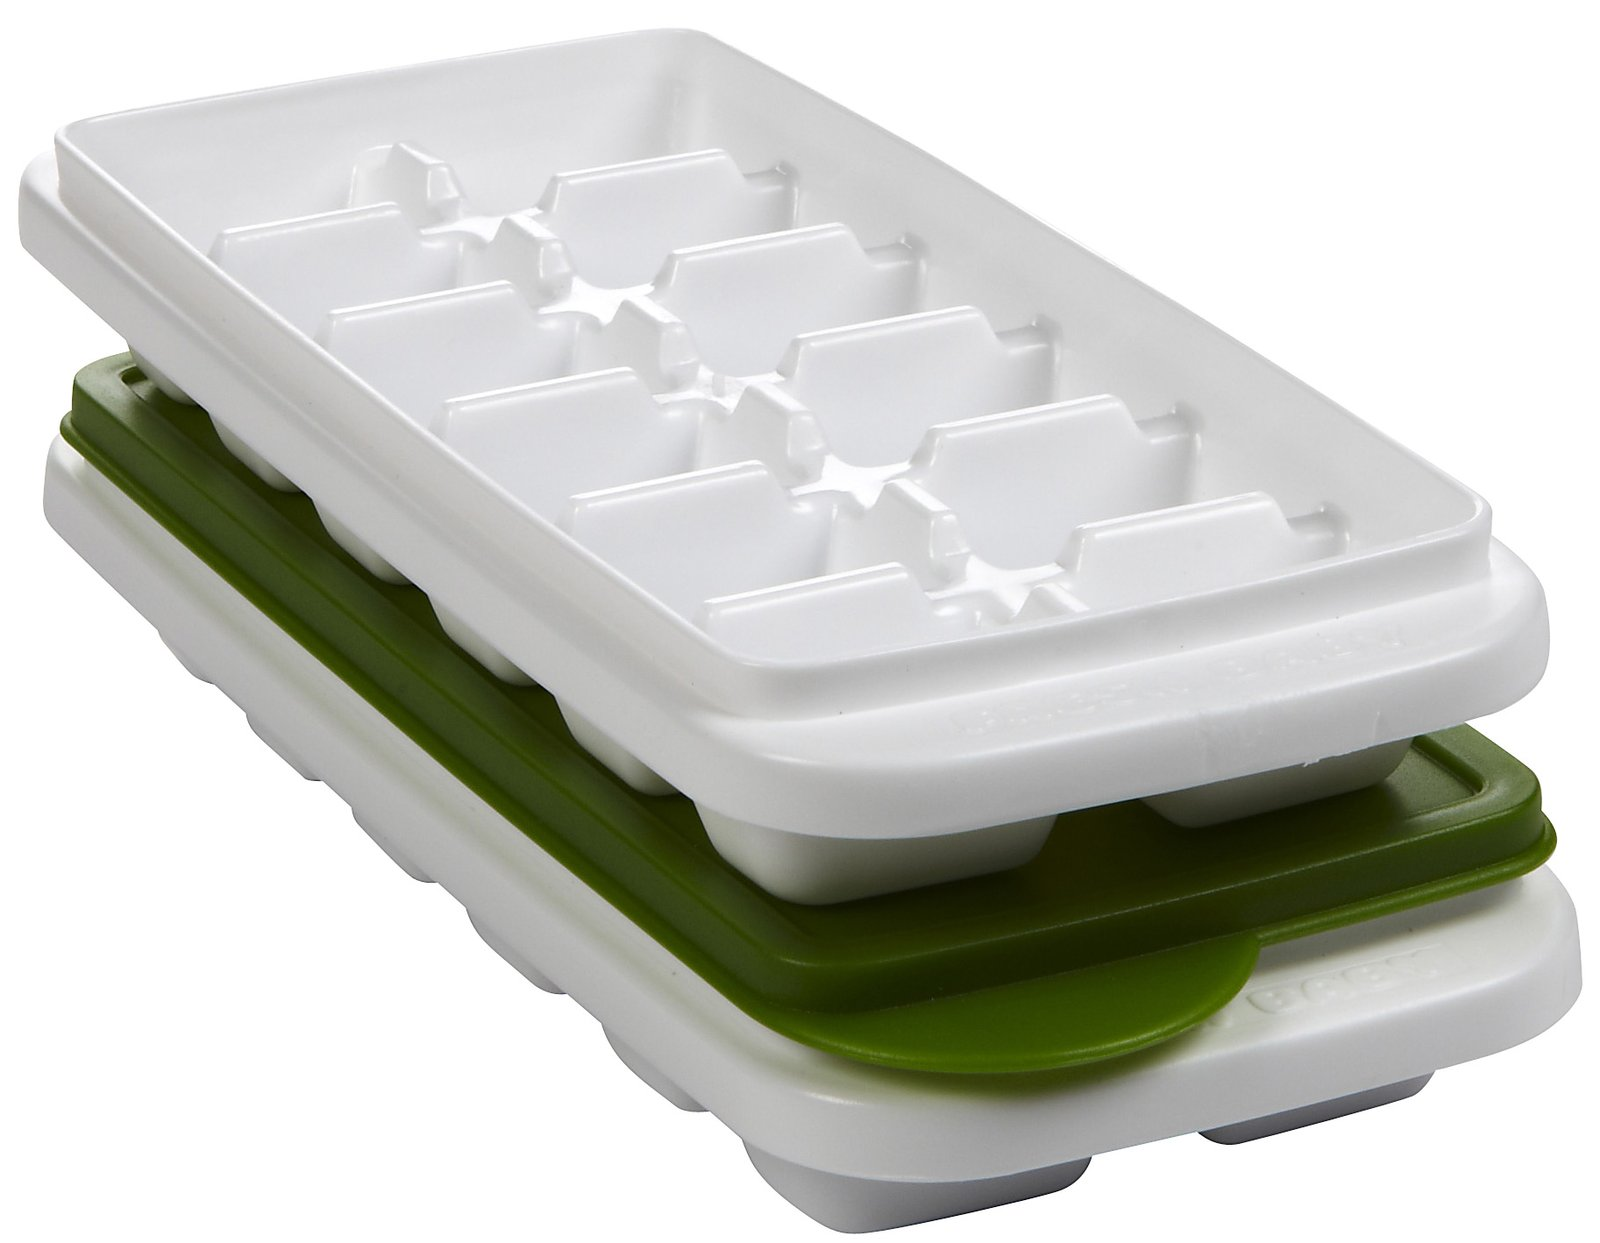 sc 1 st  SheKnows & Fresh Baby Food Storage Trays - Gift Ideas